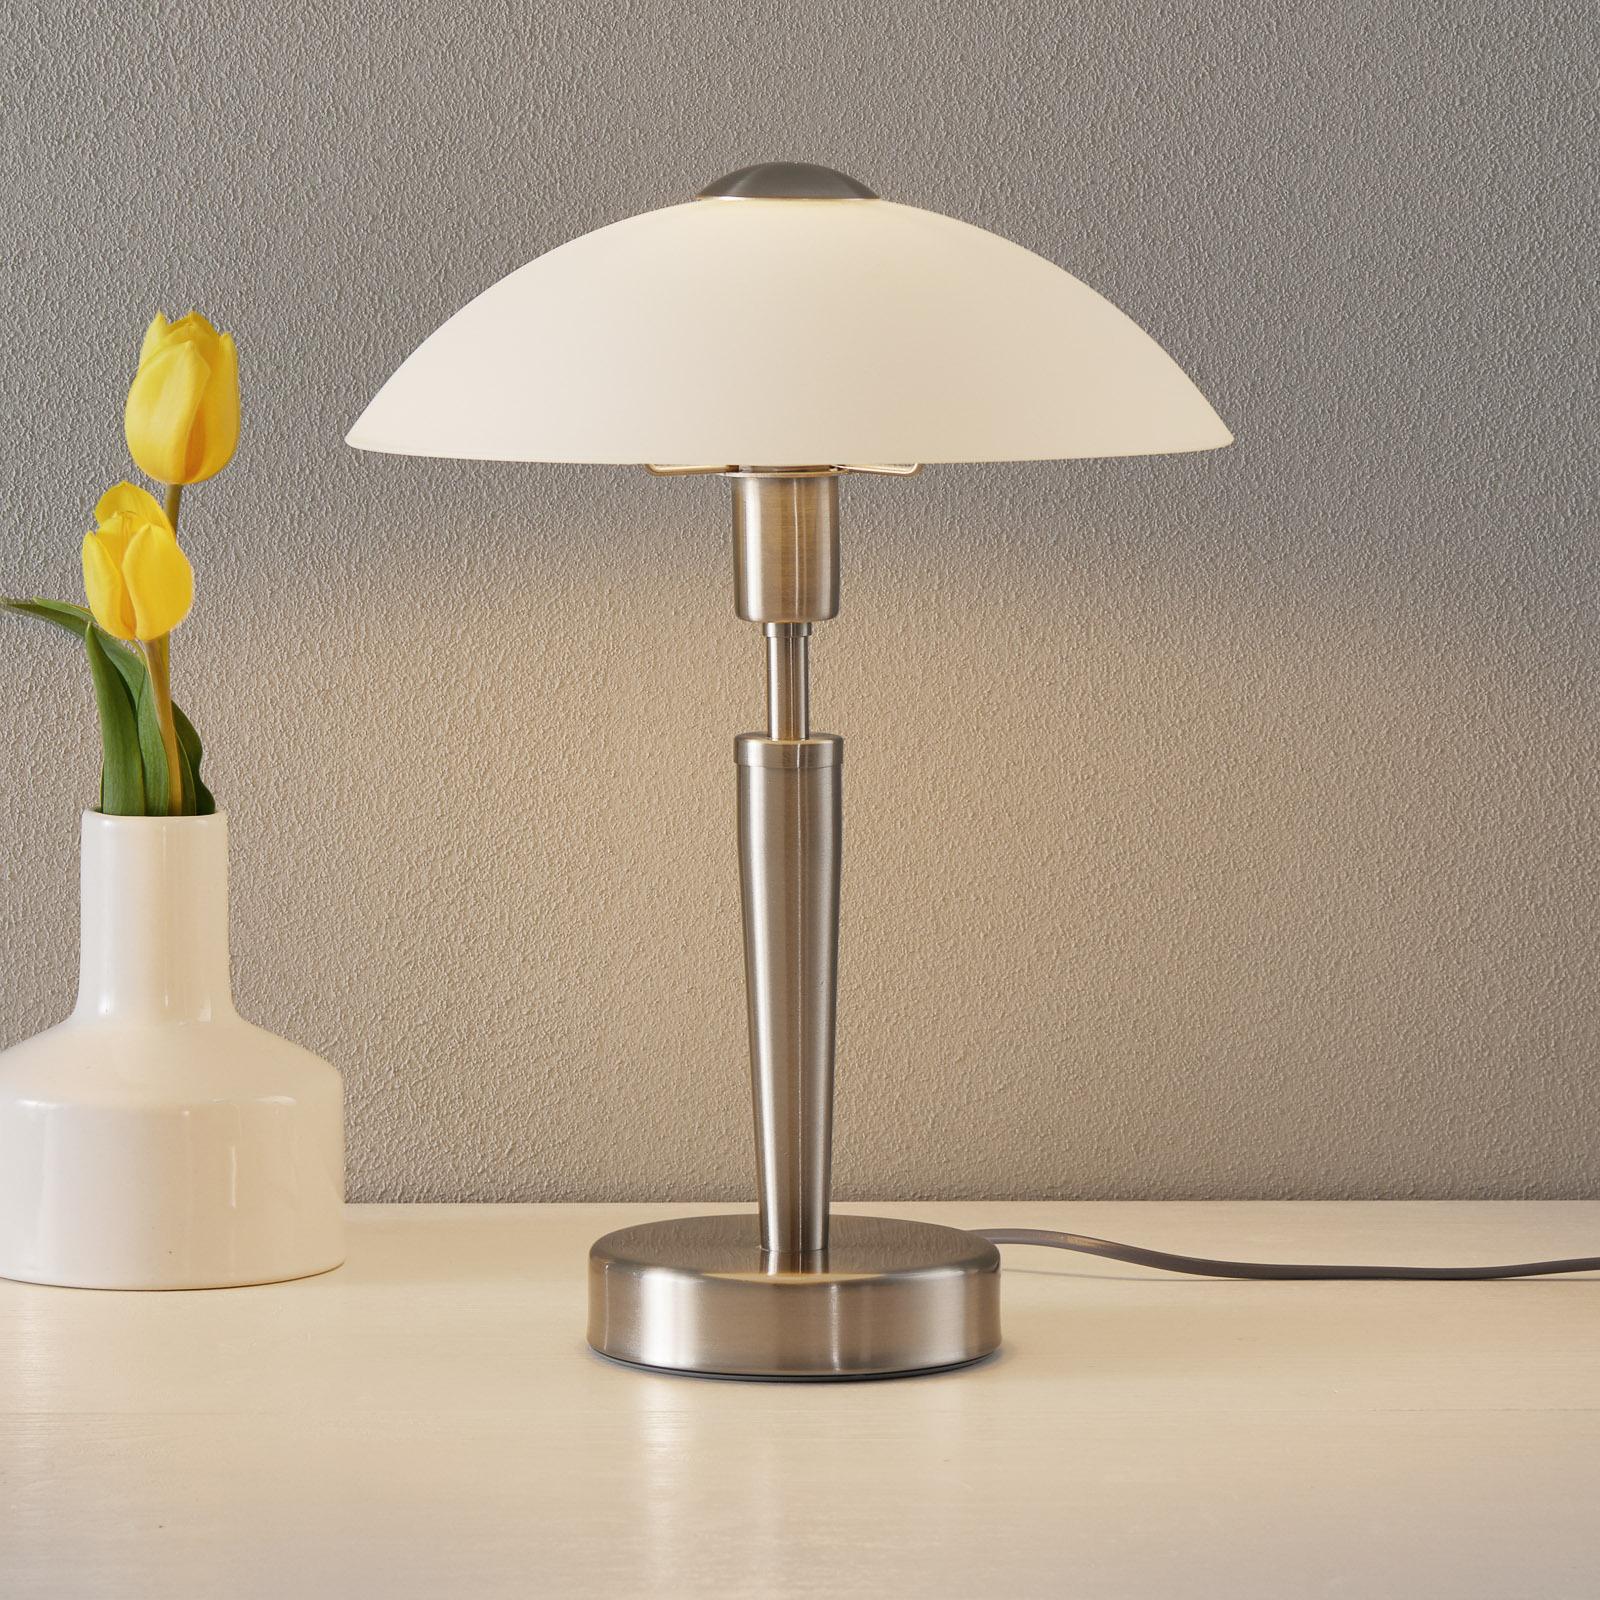 Elégante lampe à poser Salut, nickel, blanc